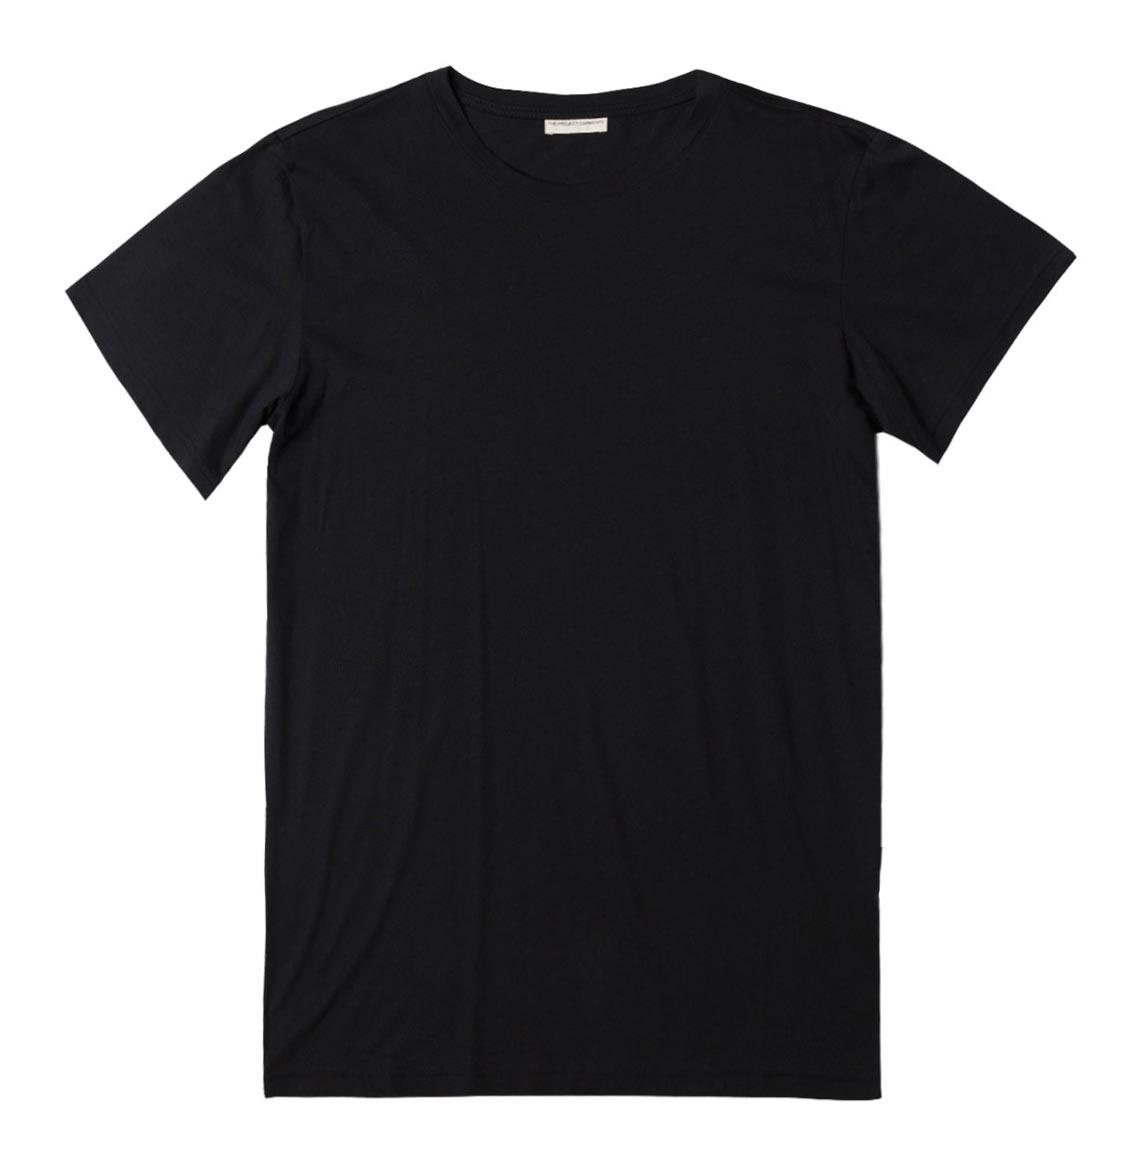 The Project Garments Crew Neck Organic Cotton T-shirt Black